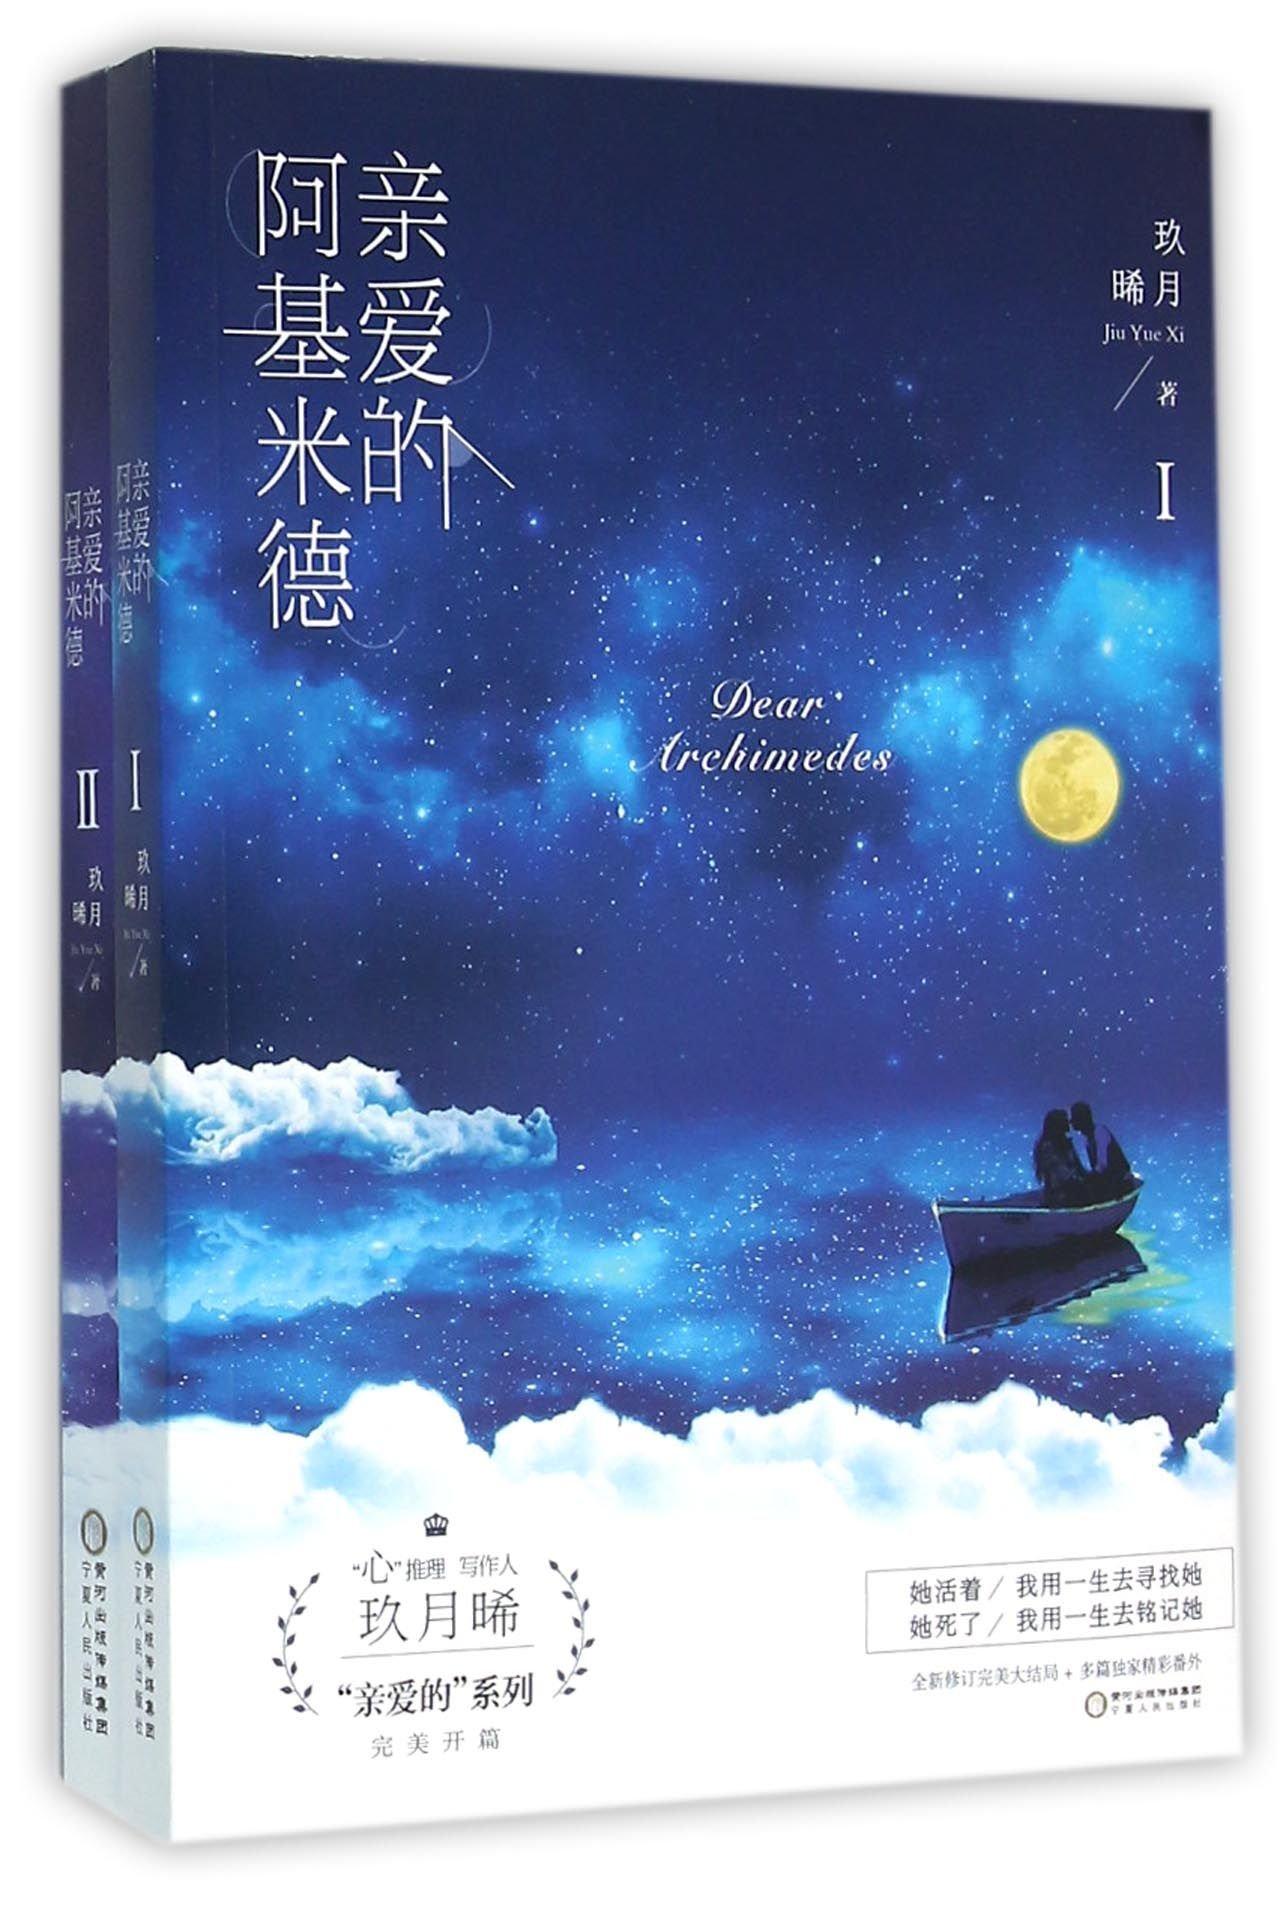 Download Dear Archimedes (Chinese Edition) pdf epub